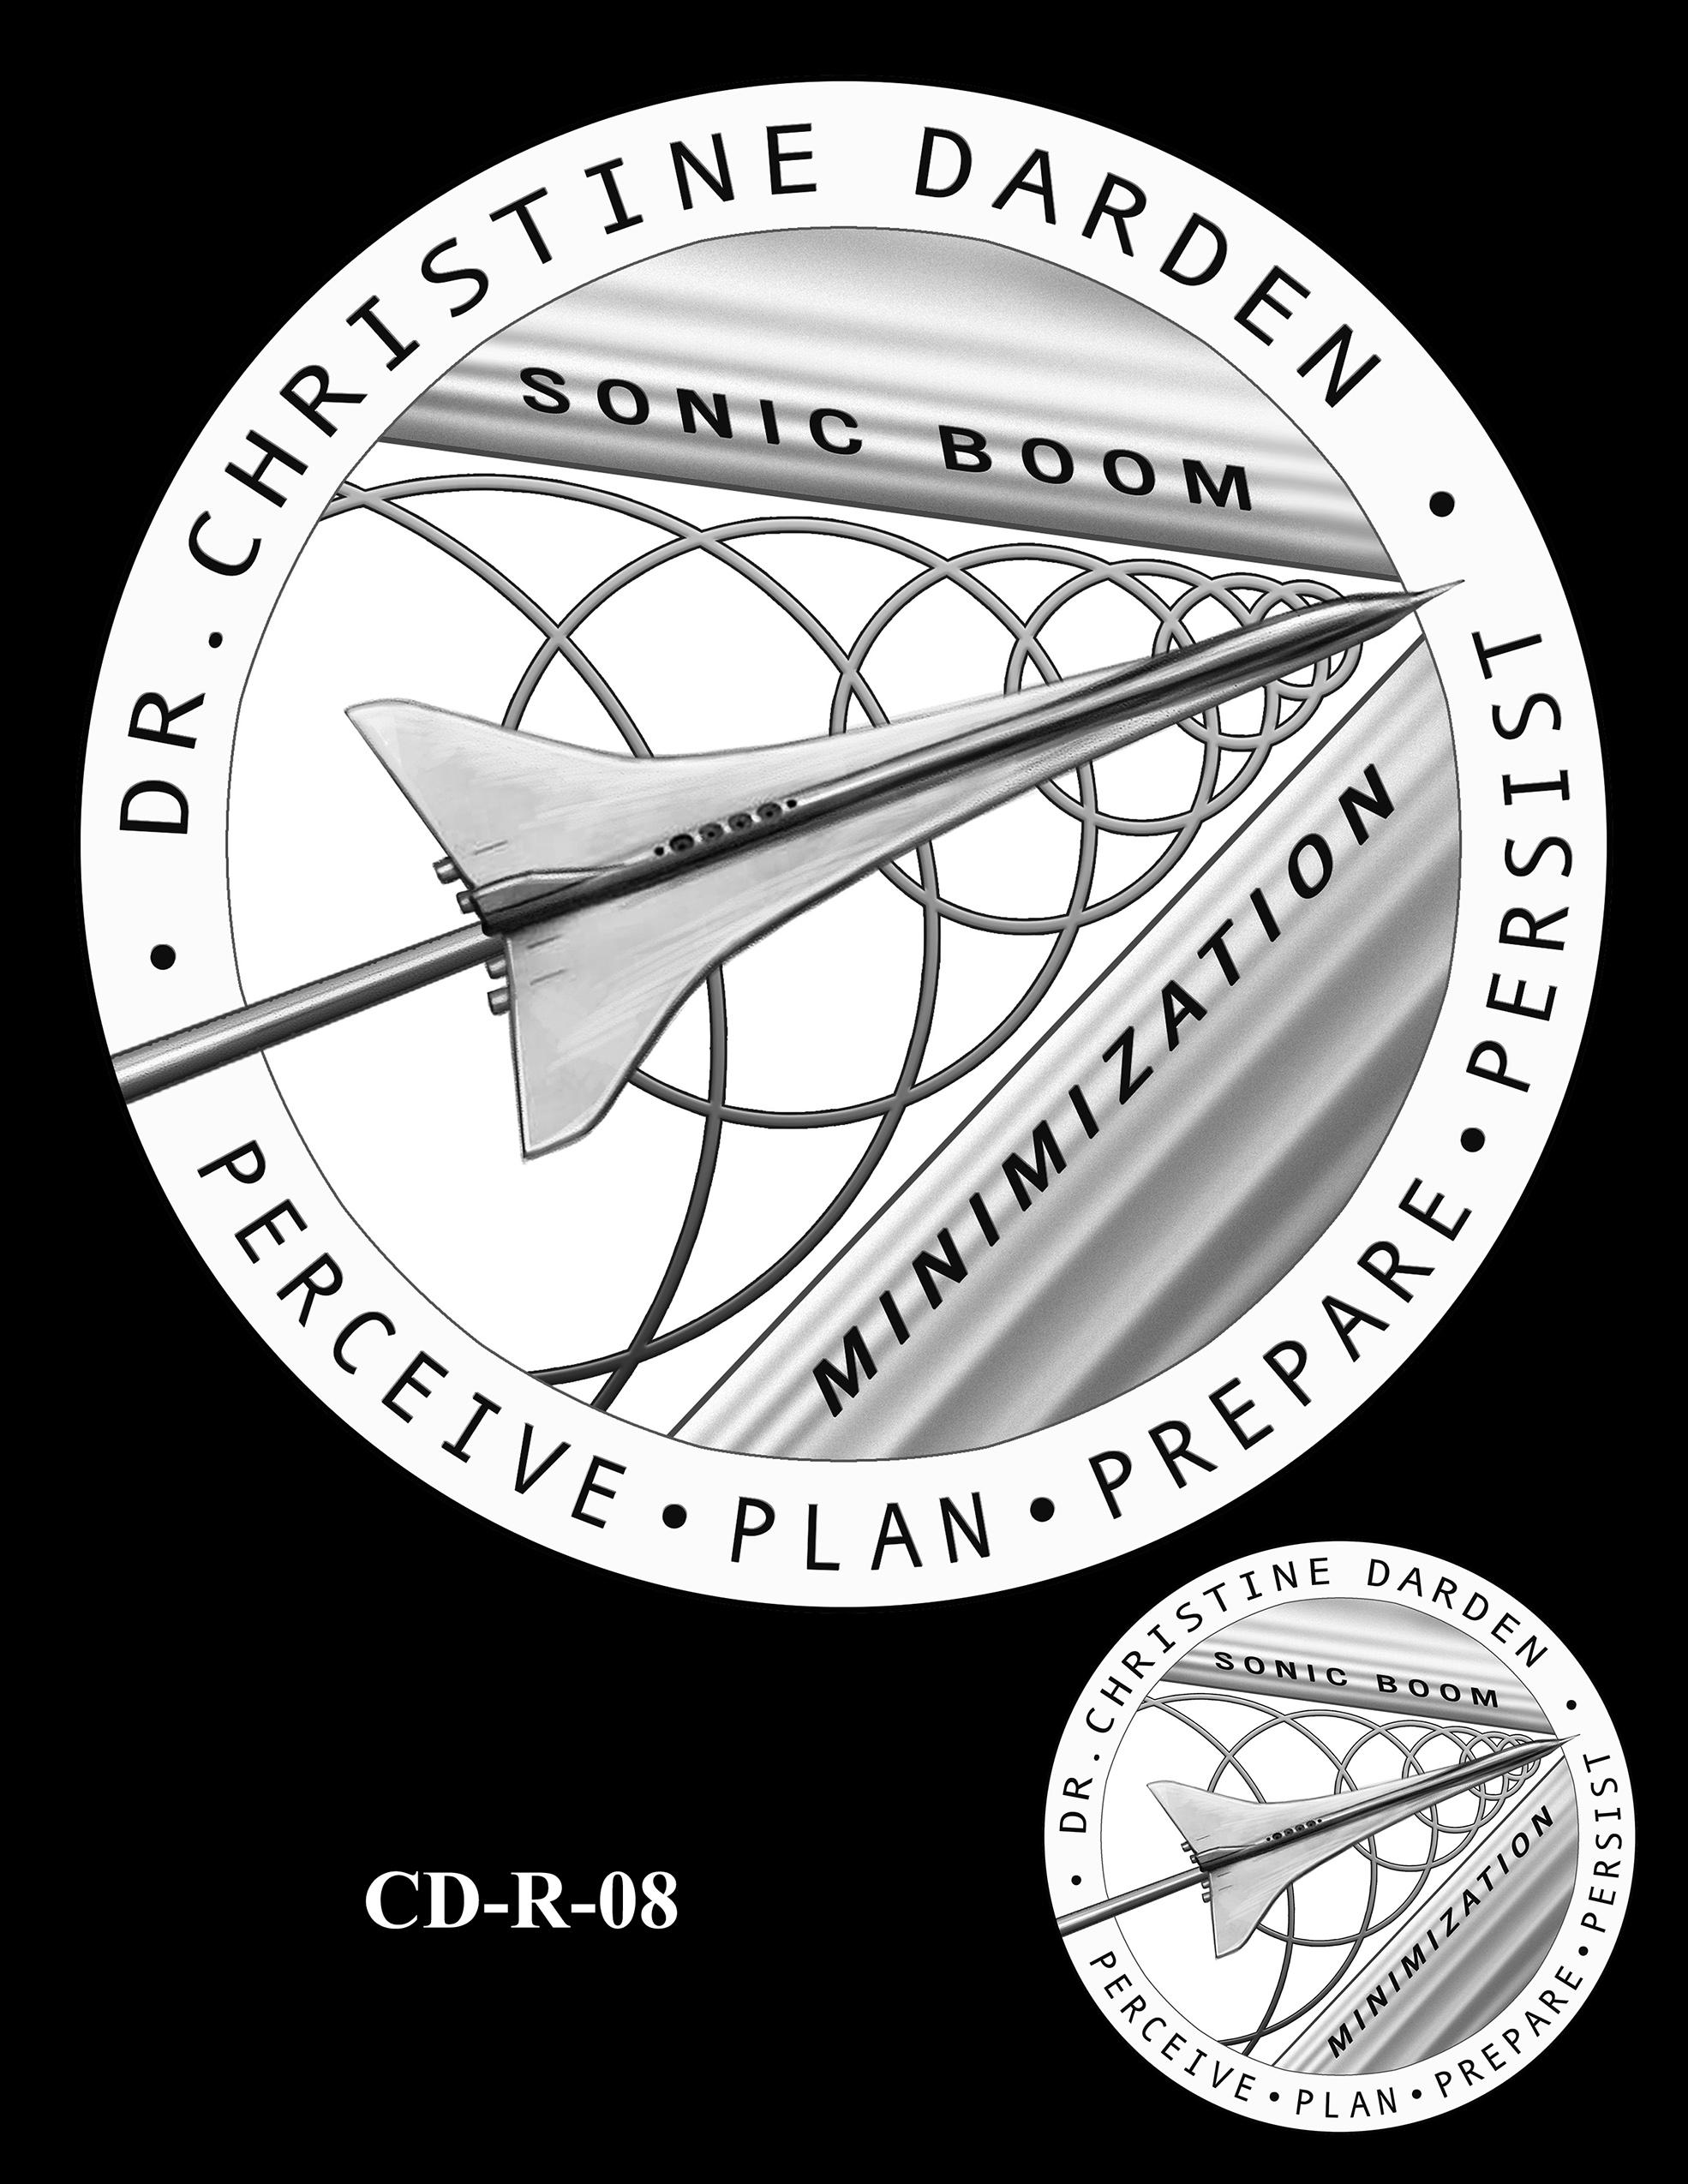 CD-R-08 -- Dr. Christine Darden Congressional Gold Medal